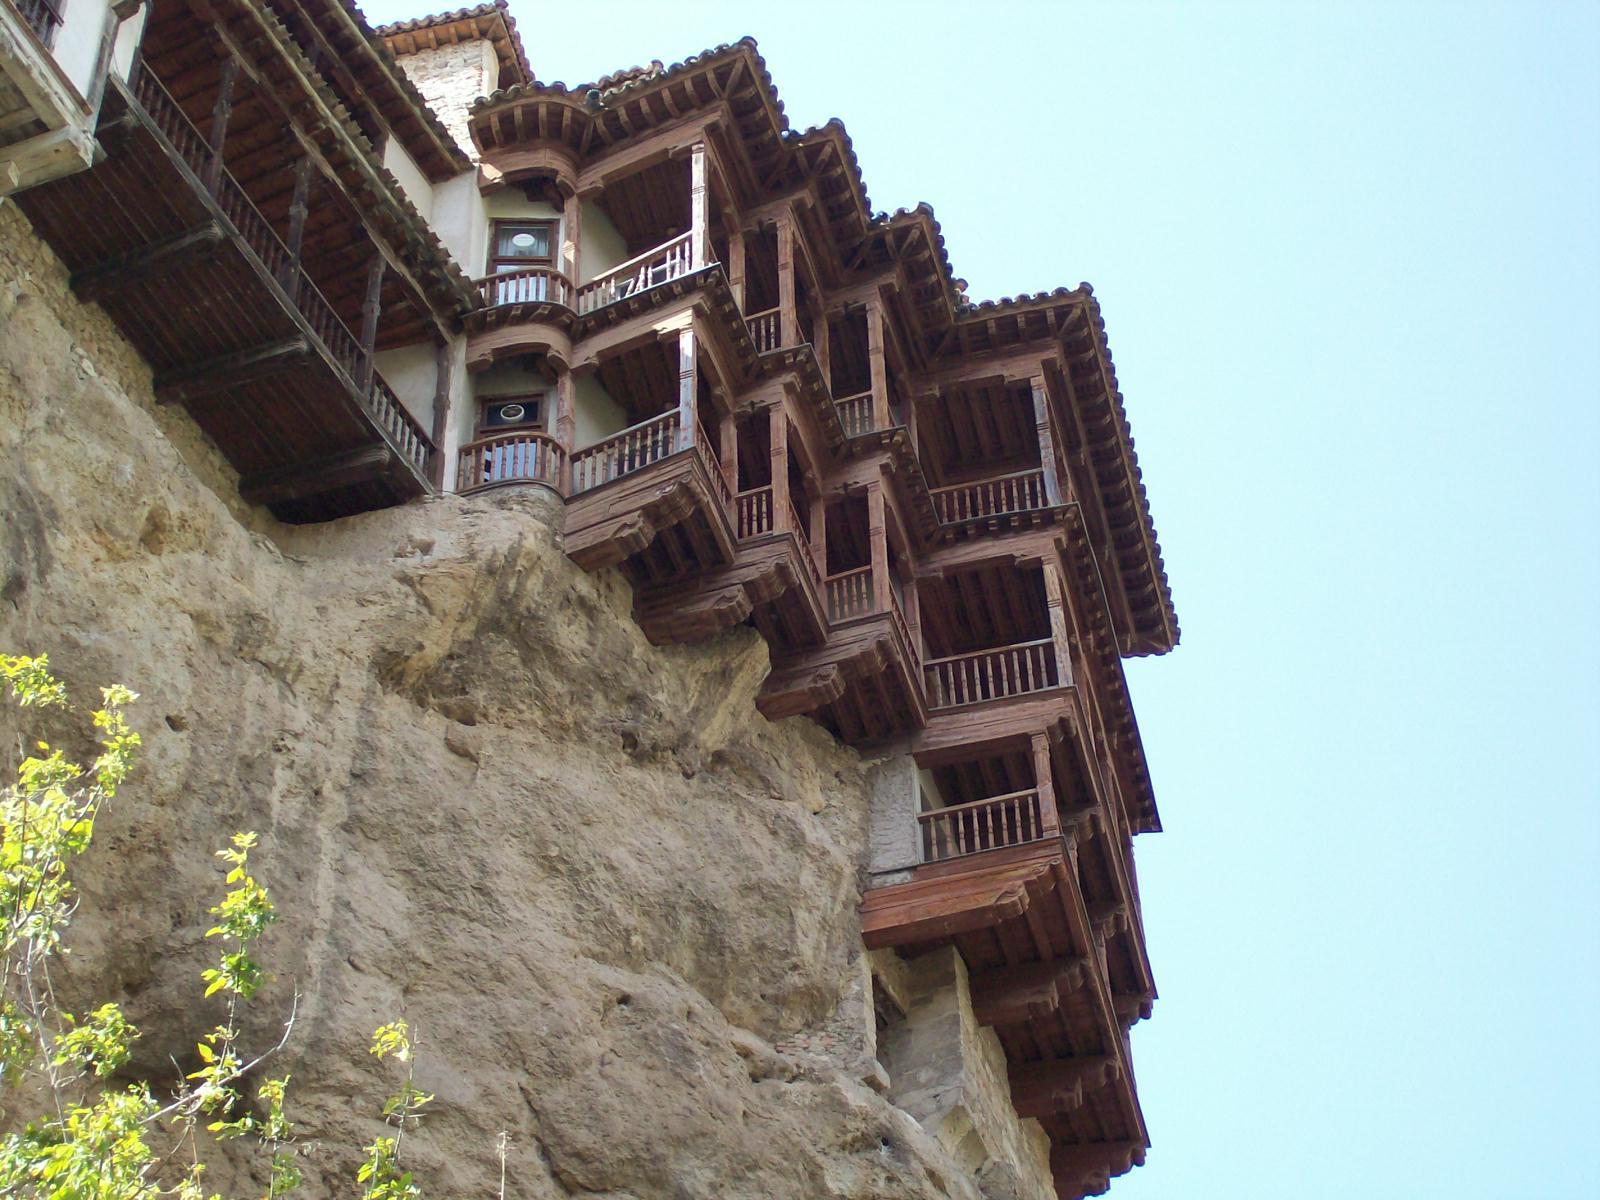 Cliffside_dwellings_of_ronda_spain on Thats